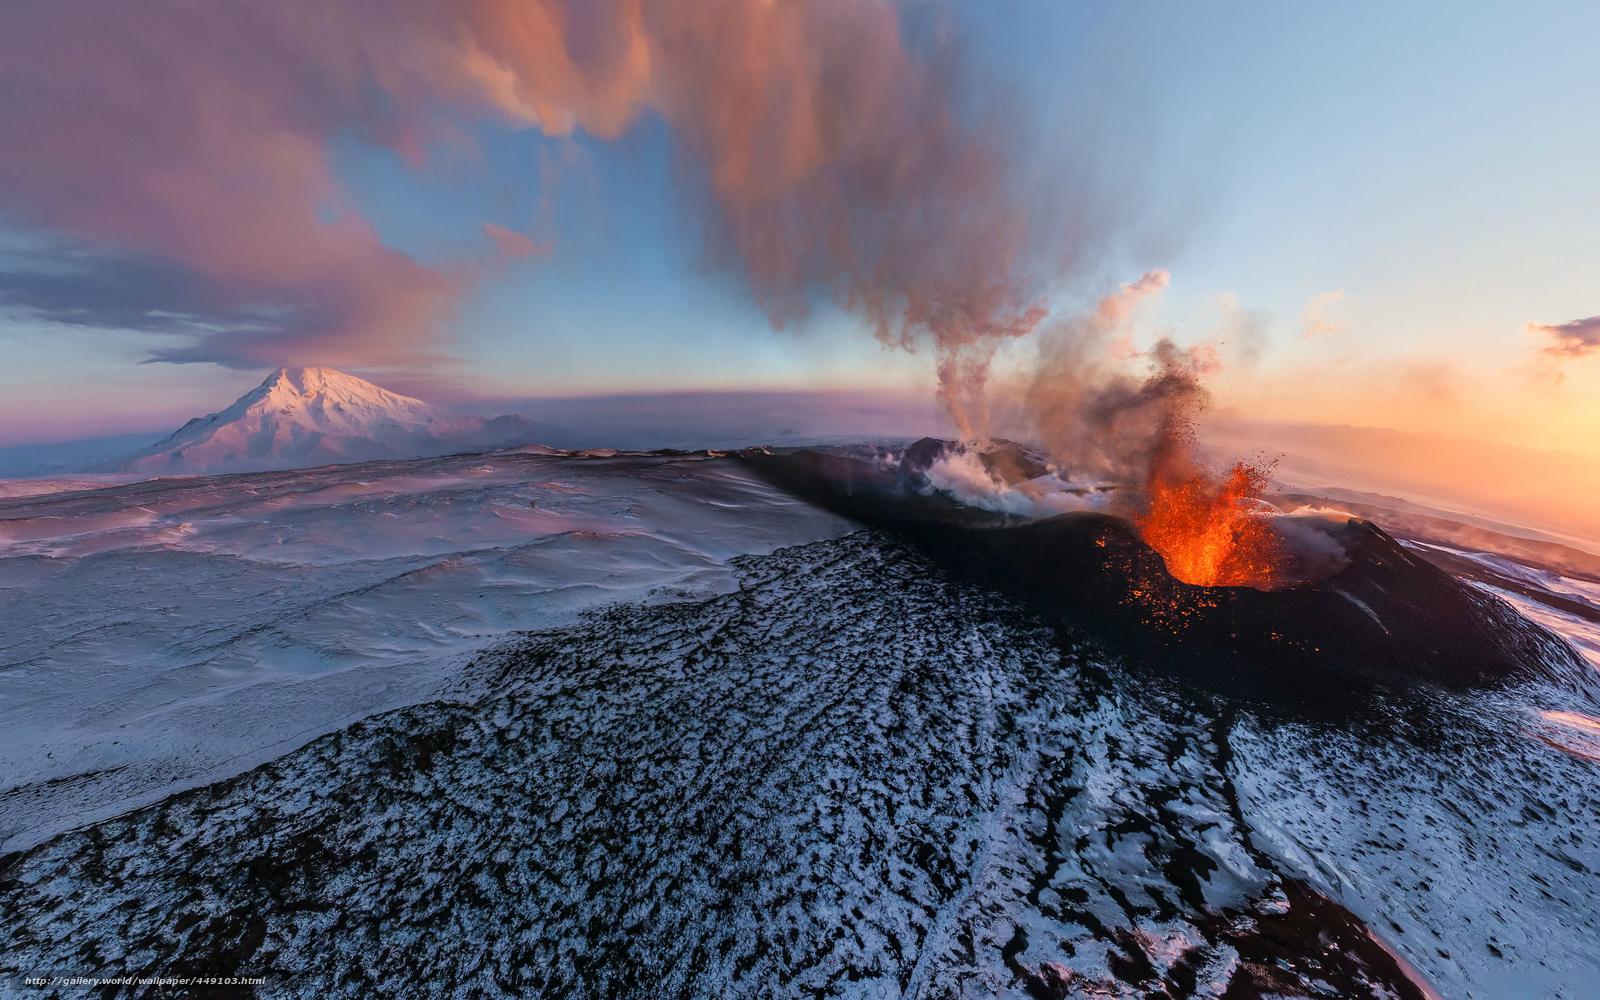 Download wallpaper Flat Tolbachik volcano eruption Kamchatka 1600x1000